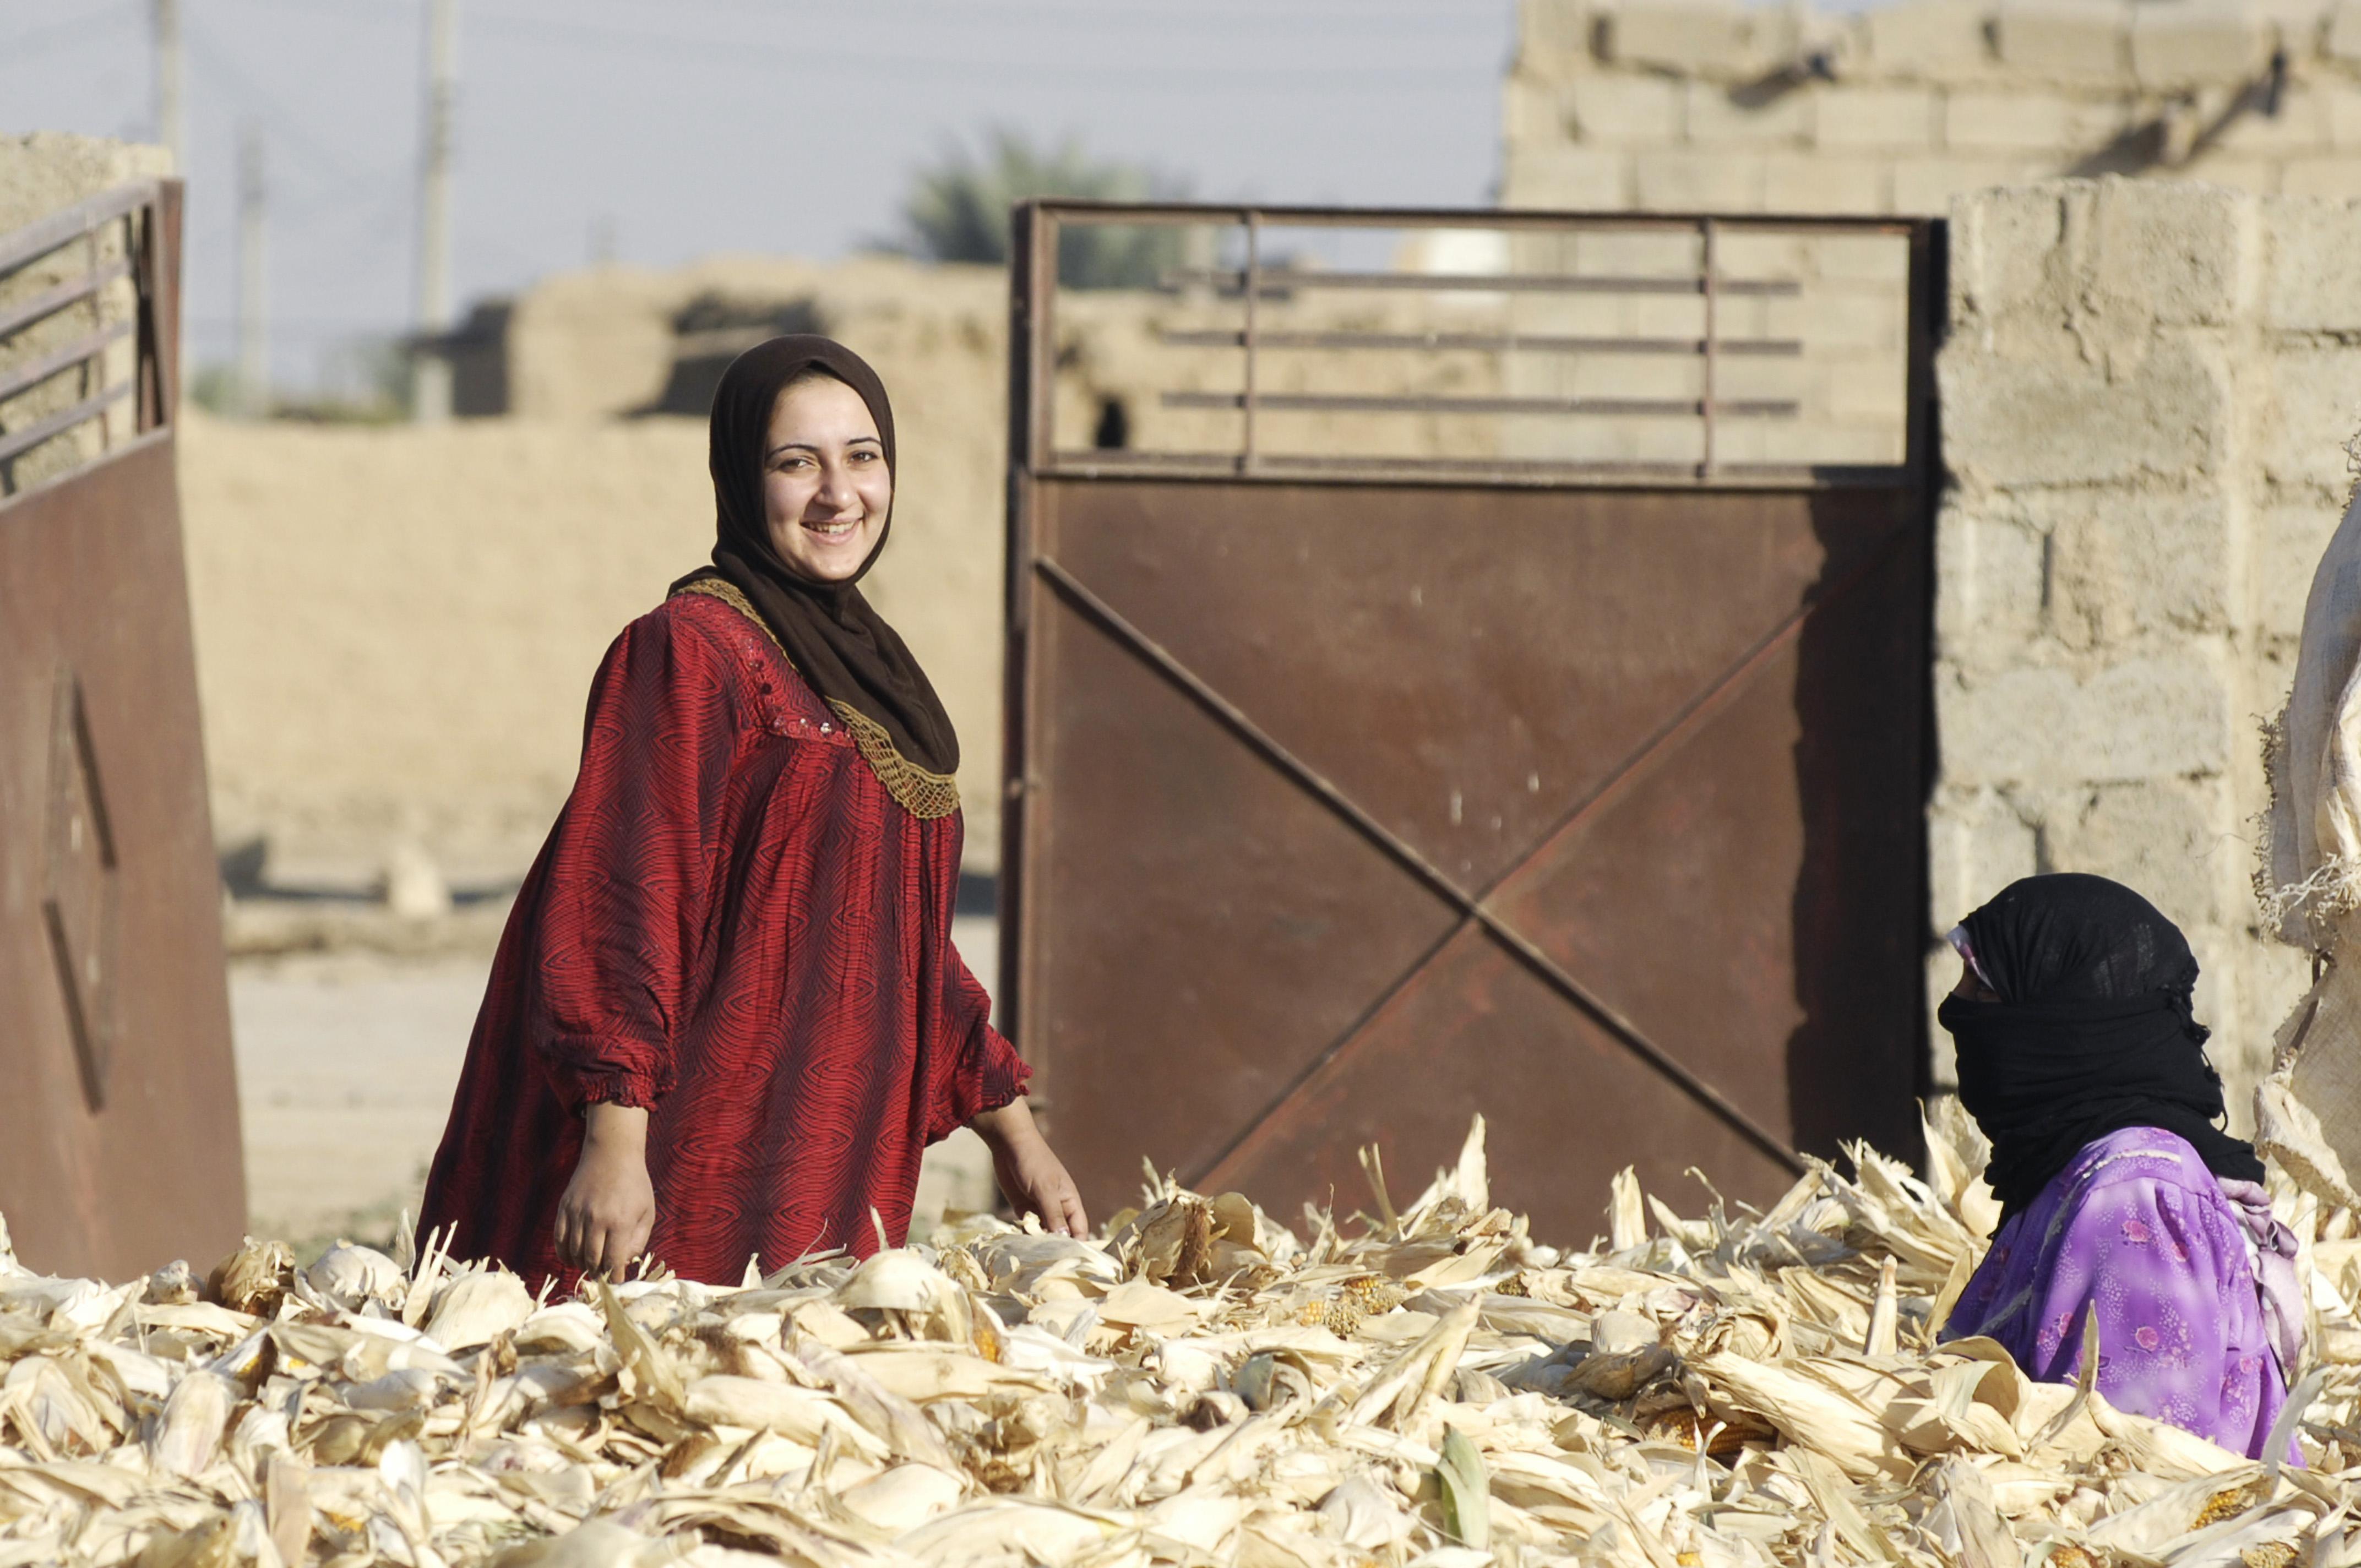 Can Iraq Avert Economic Disaster?    Iraqi_women_shuck_corn_for_bread_in_the_village_of_Al_Kahn_in_Kirkuk_Iraq